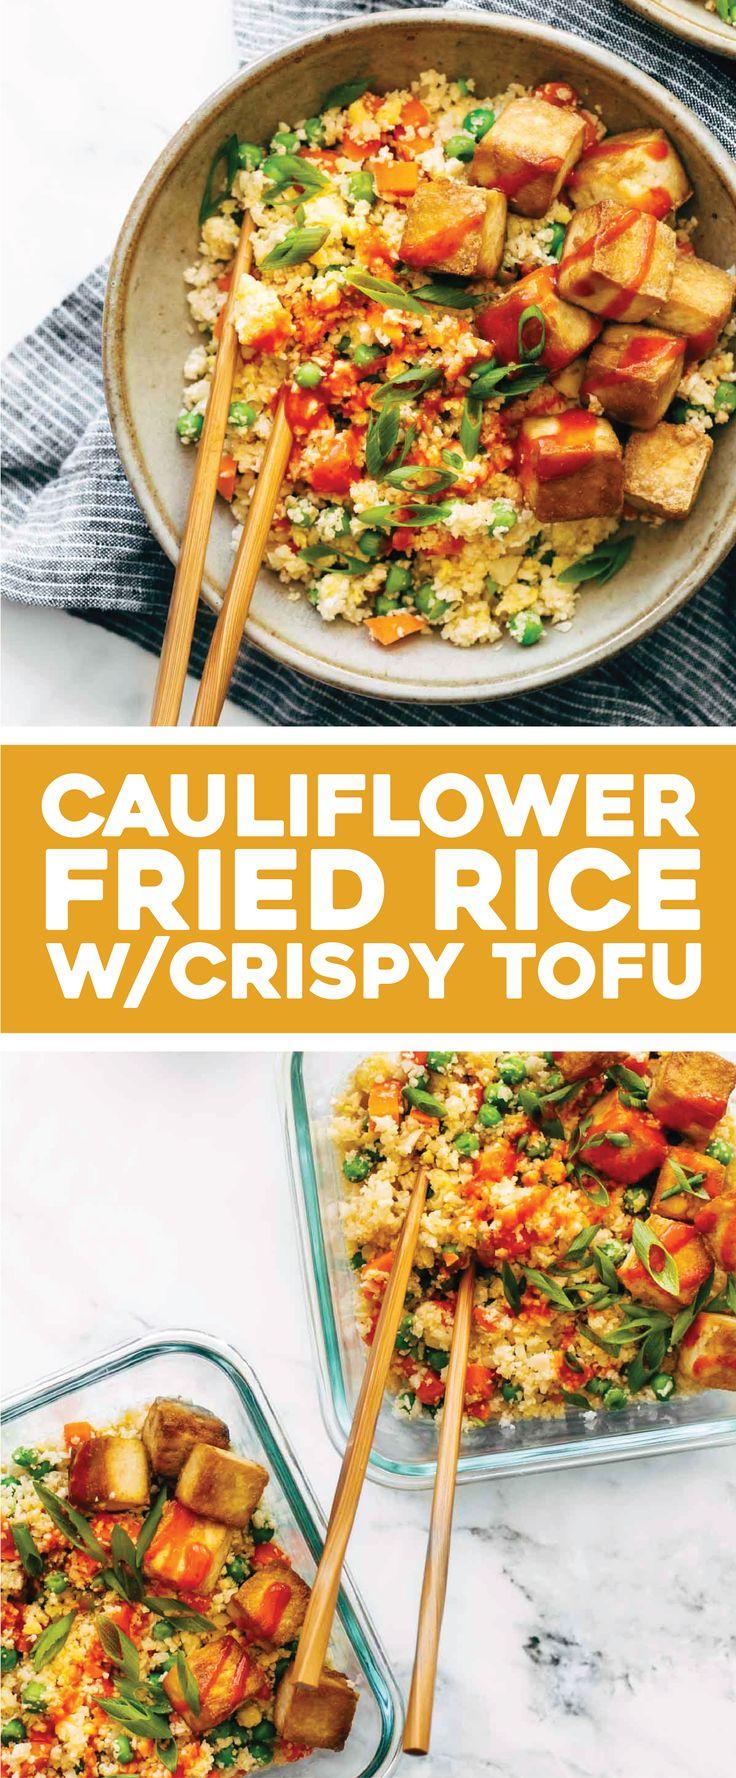 a8ba14fcbb19ebc36af2feebe63996d6 15 Moment Food Preparation   Cauliflower Fried Rice along with Crispy Tofu   Dash of Yum